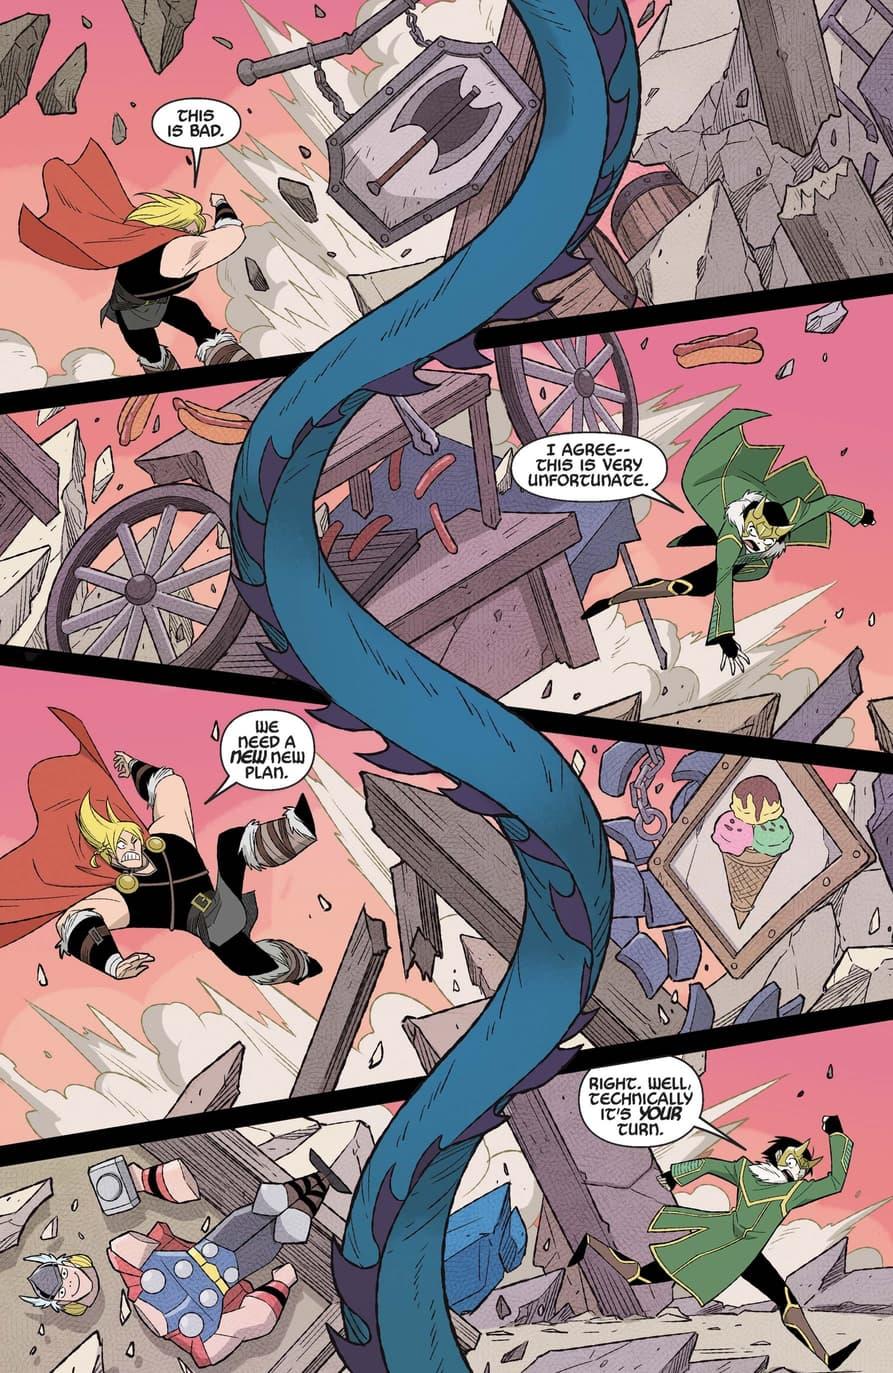 Thor and Loki take on a Midgard Serpent.